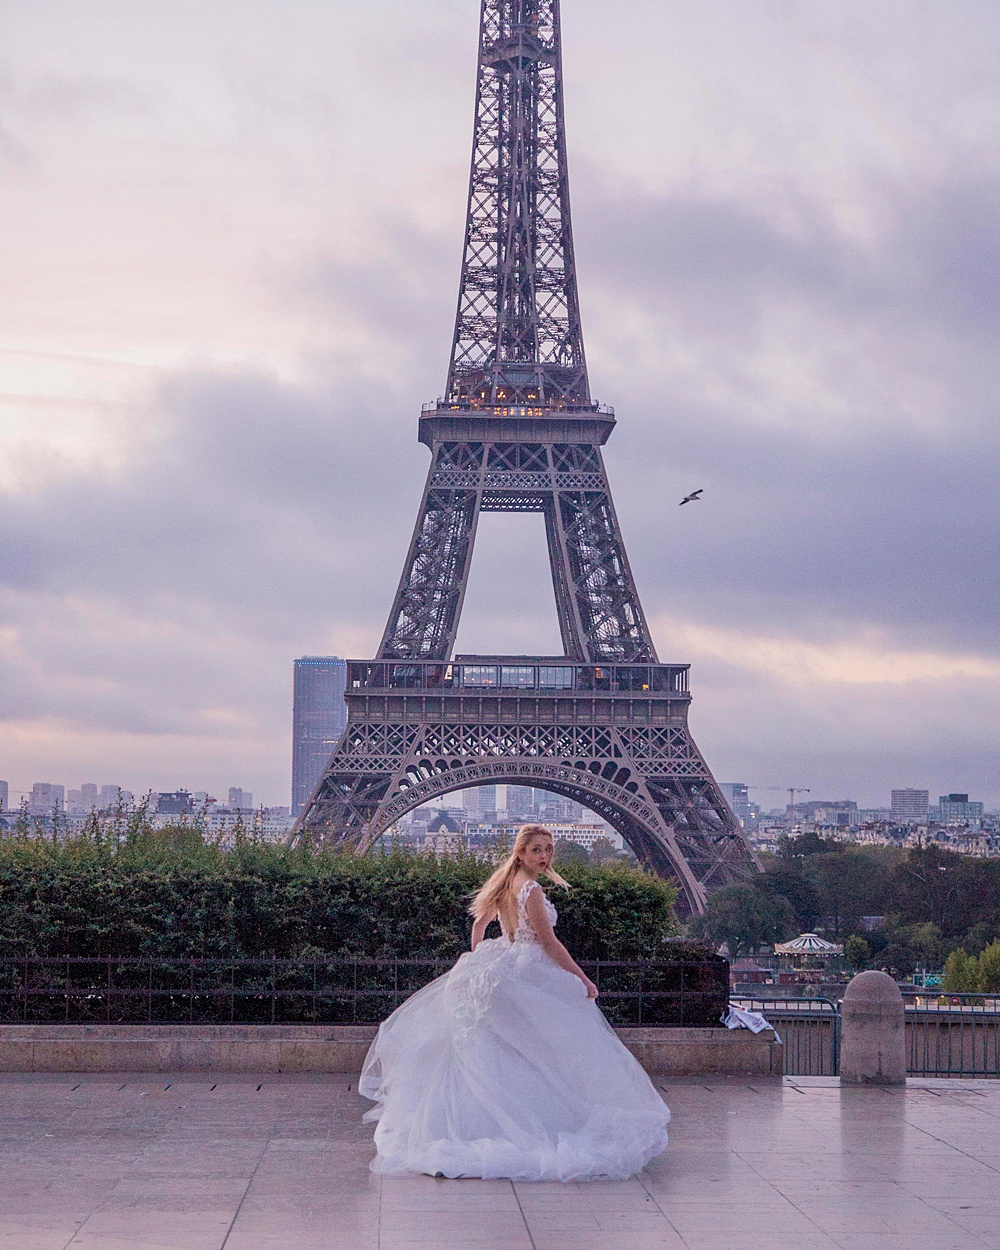 Eiffel Tower Wedding Inspiration